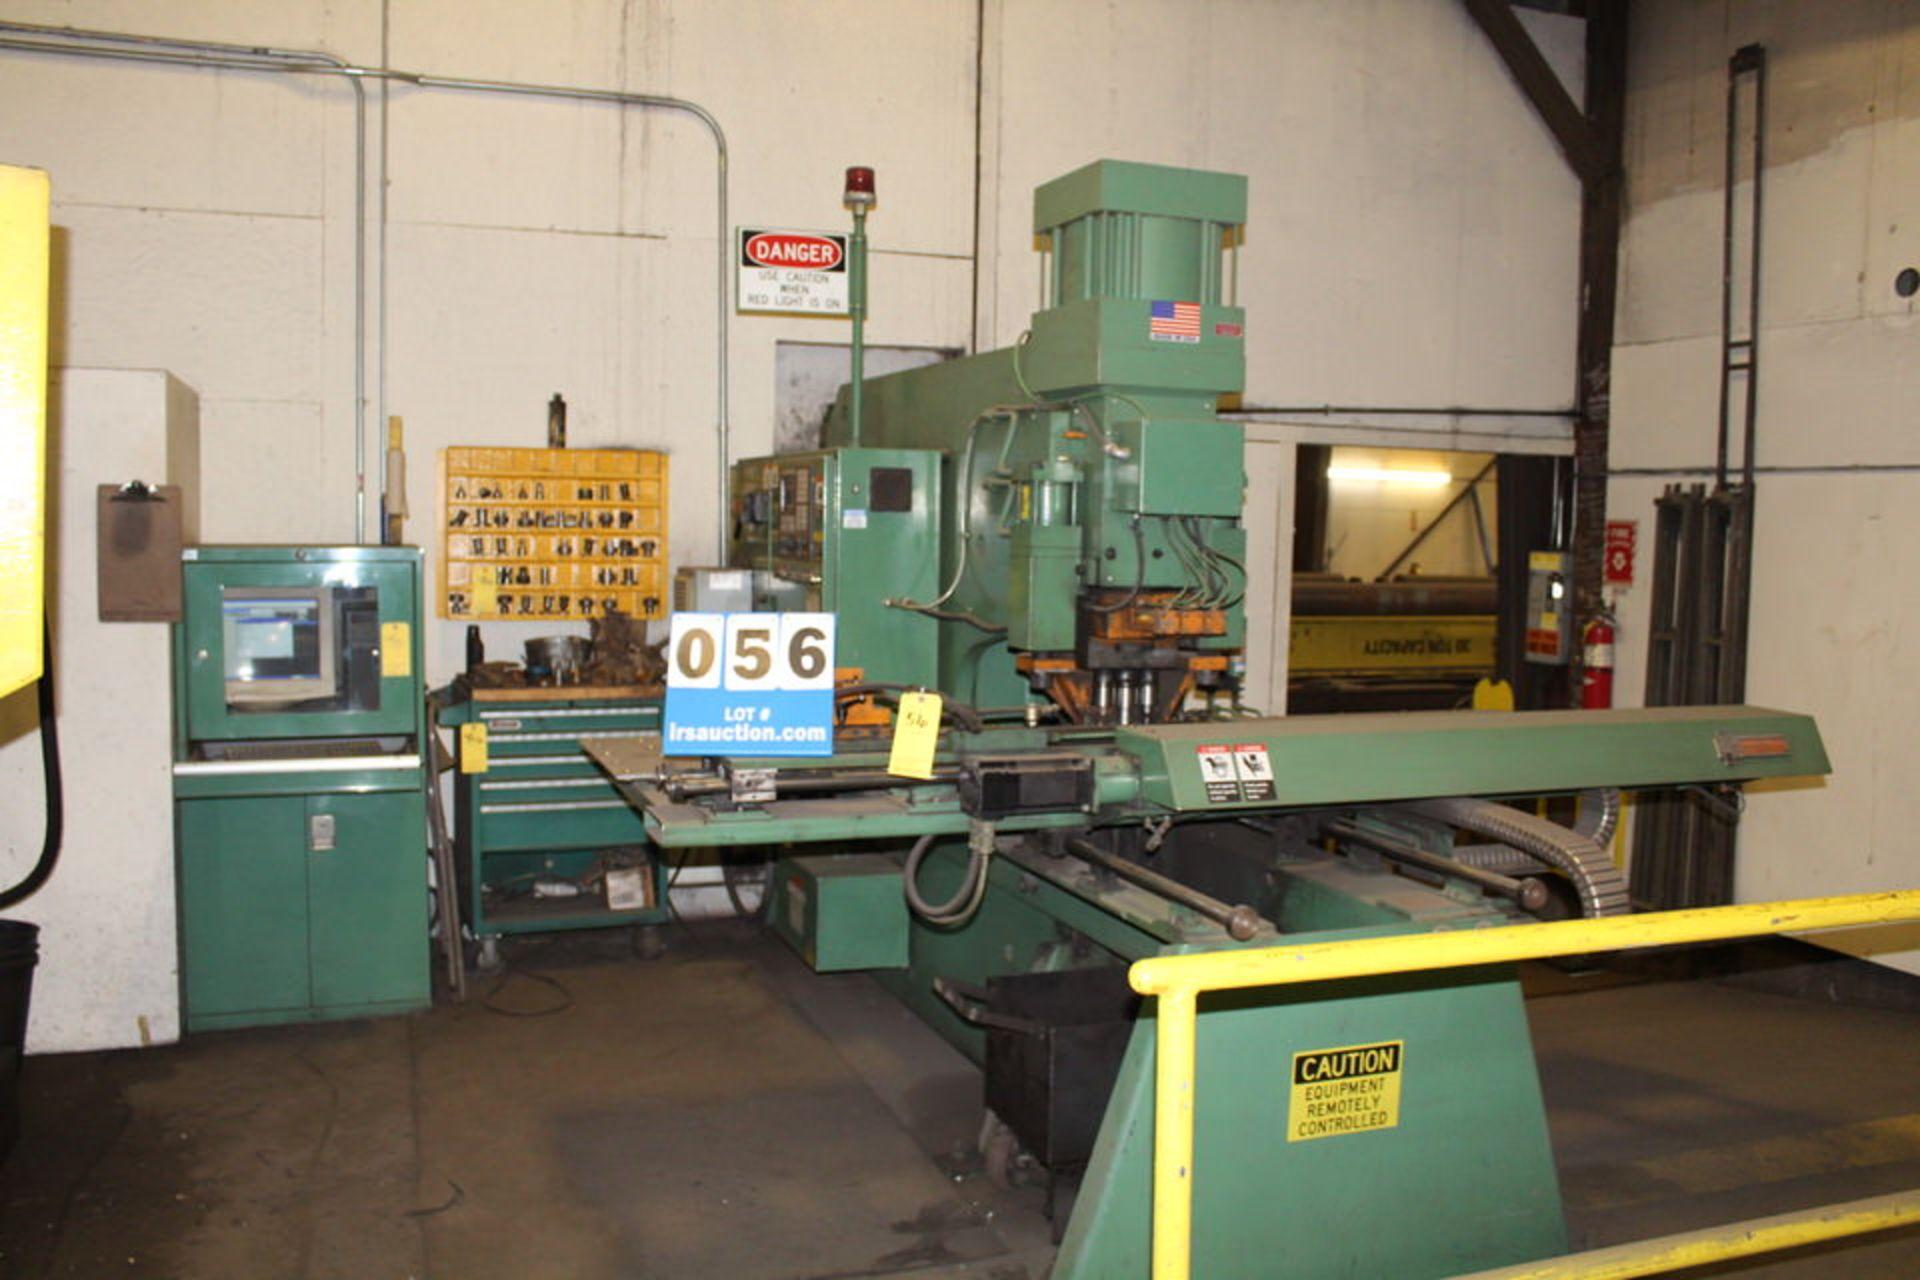 Lot 56 - 2002 PEDDINGHAUS F1170-B CNC PUNCH W/ CNC CONTROL & TOOLING (LOCATION: 4081 EASTSIDE HWY,